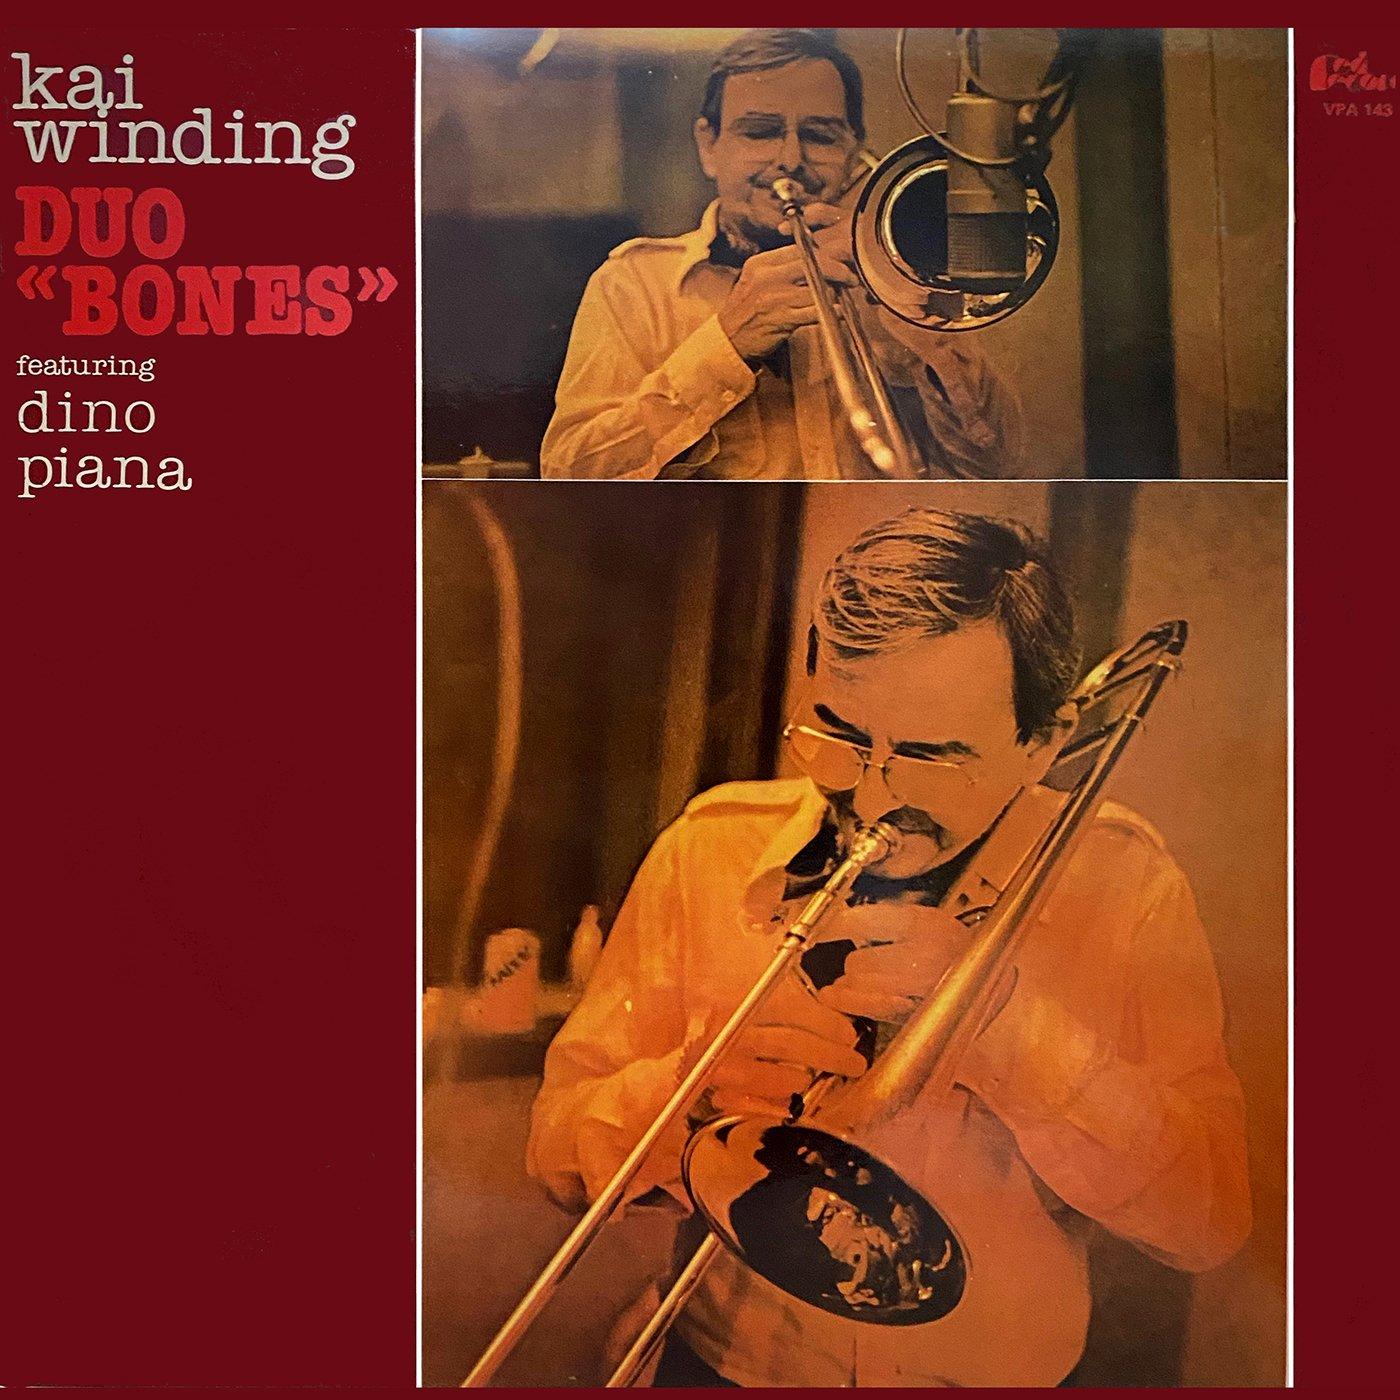 "Duo ""Bones"" - Kai WindingFeaturingDino Piana"